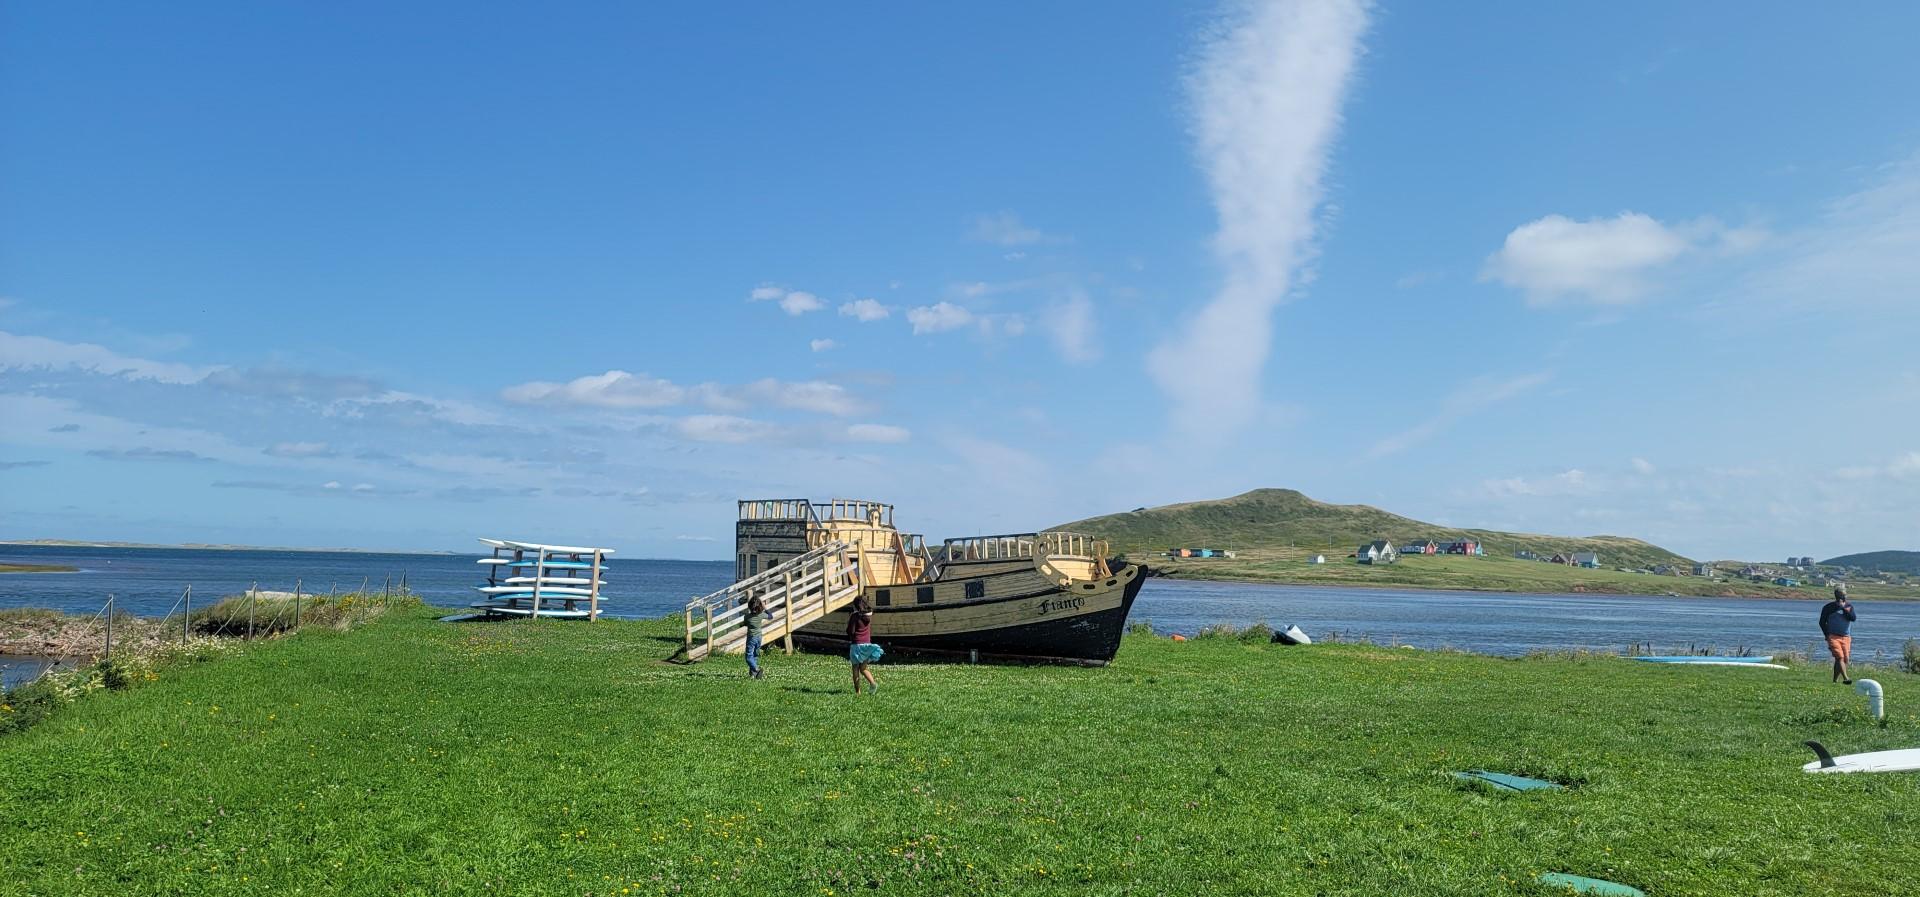 play boat on Iles de la Madeleine